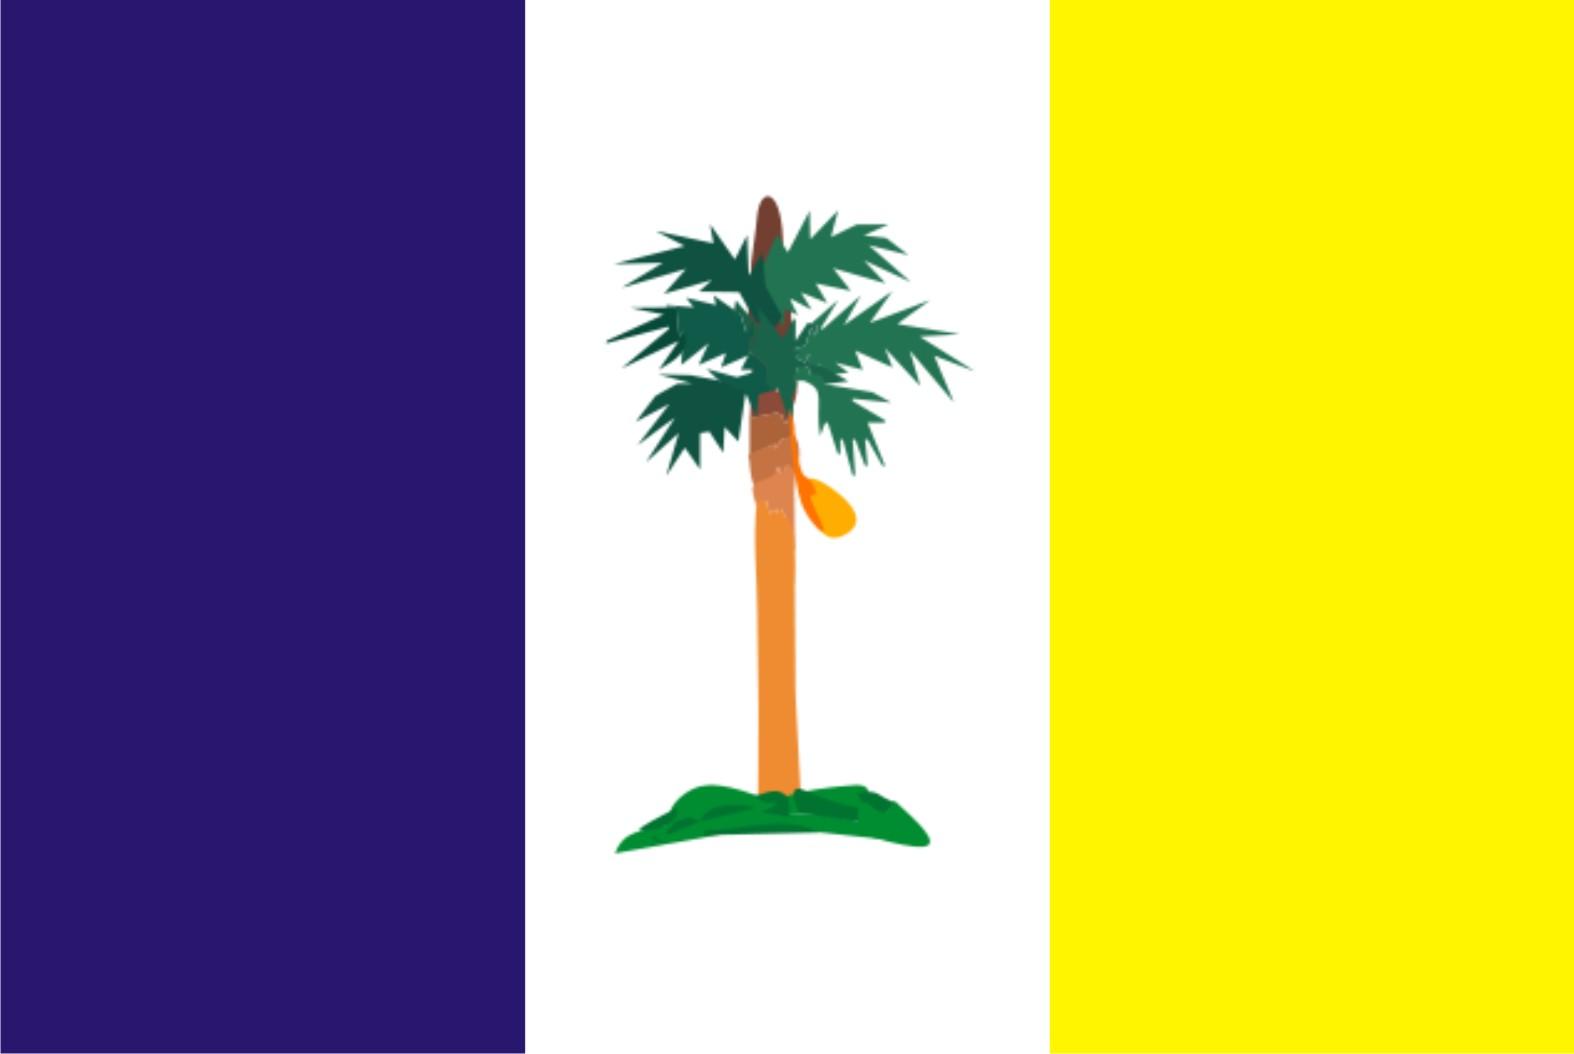 lambang bendera negara - negara bagian malaysia